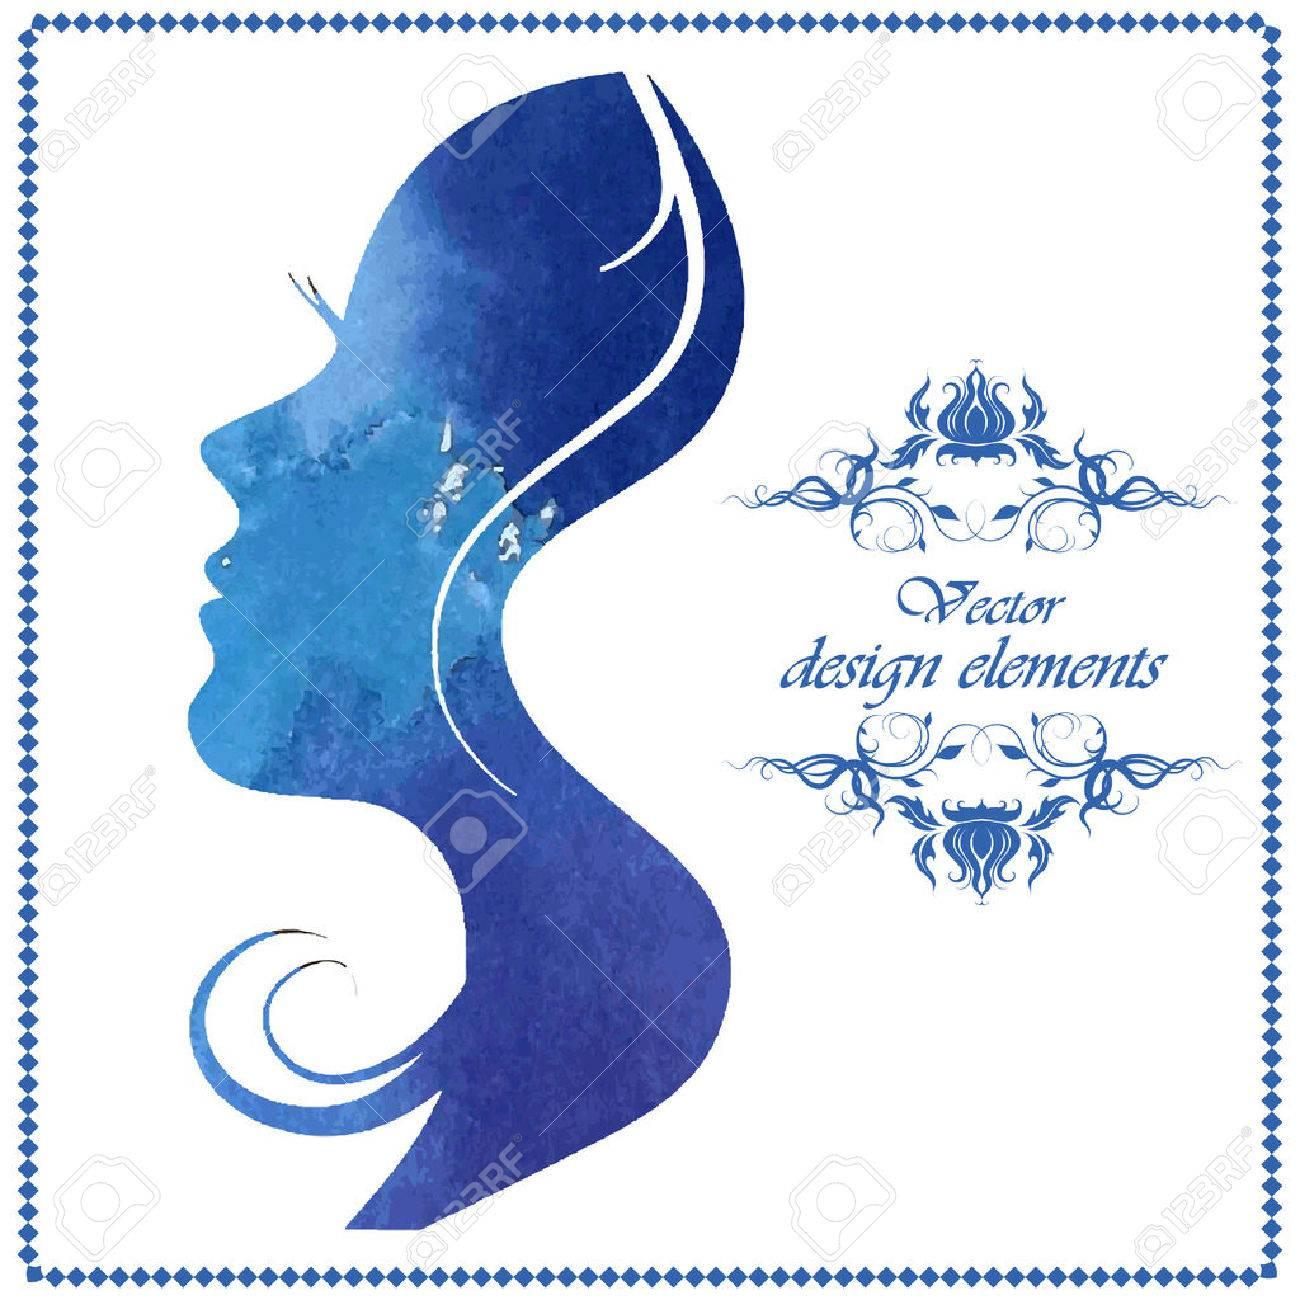 Watercolor beautiful woman silhouette. Vector illustration - 37350508